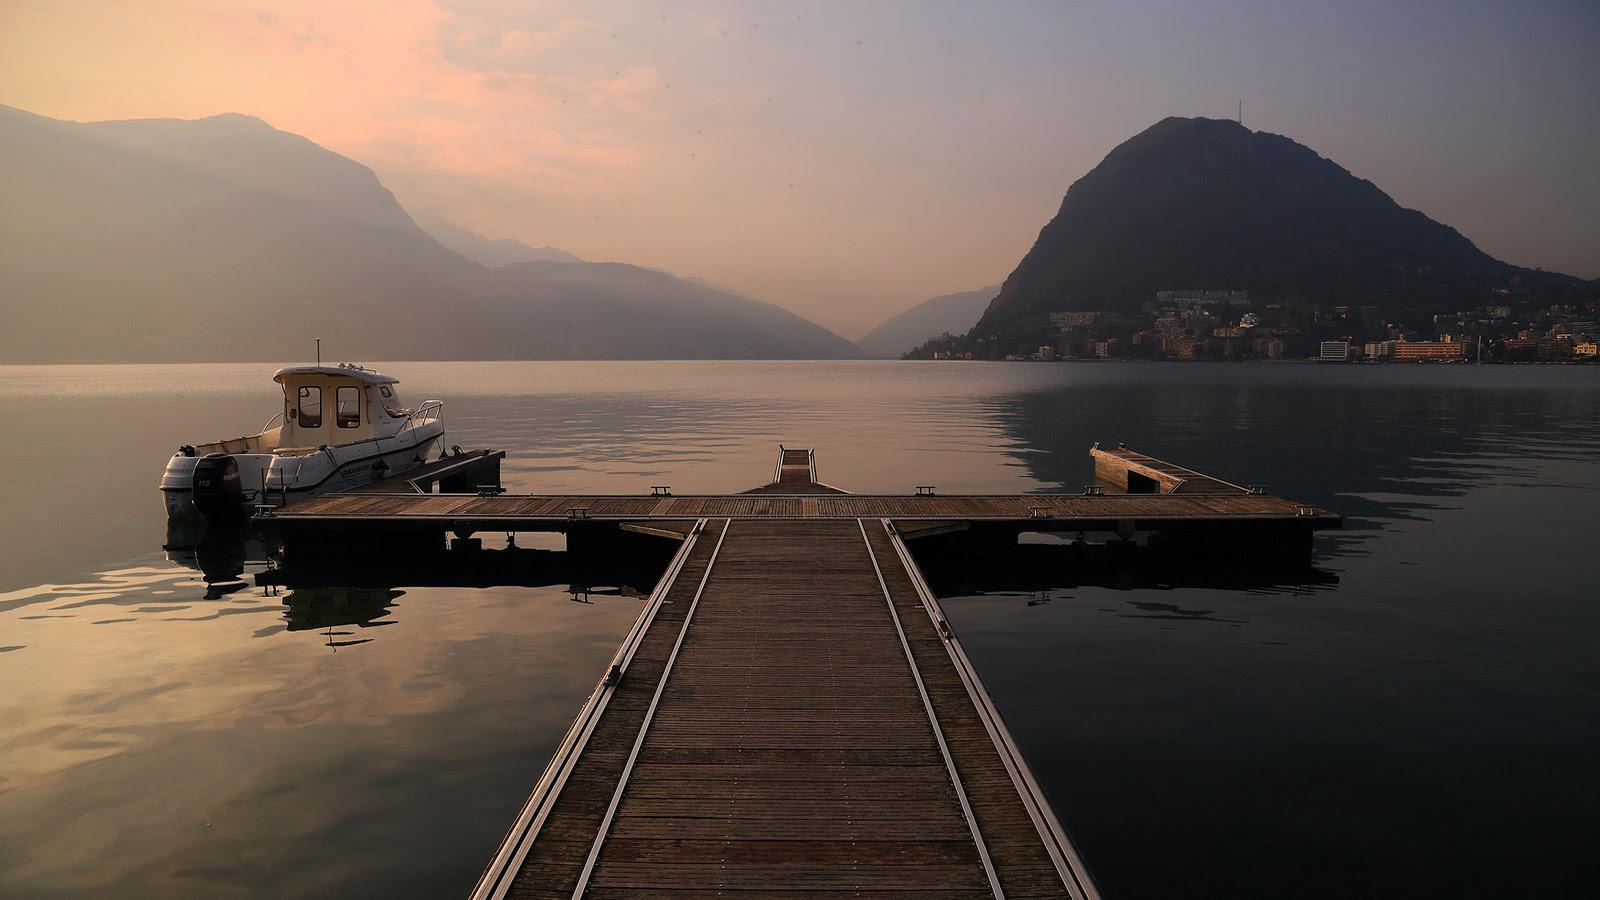 Peaceful sunrise |Switzerland (1600 x 900)